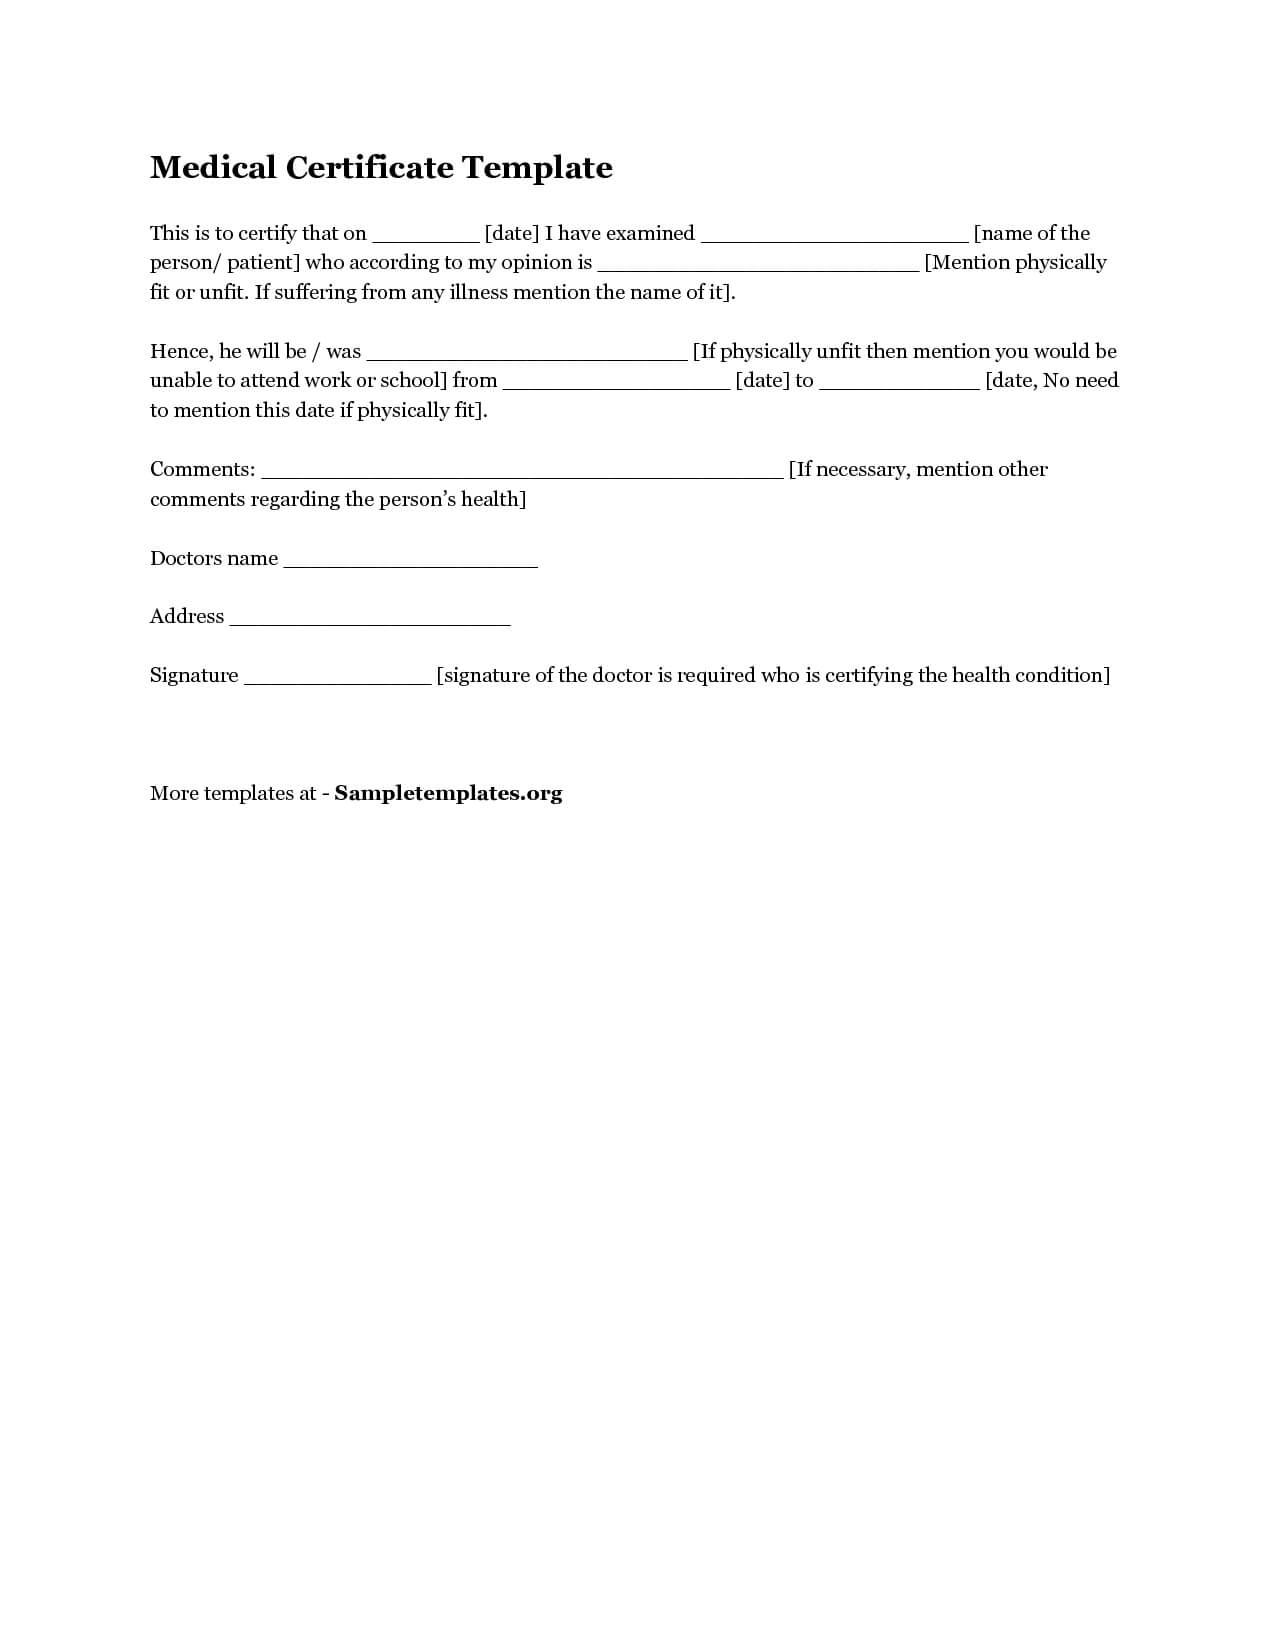 Download Medical Certificate Template1 | Certificate Pertaining To Australian Doctors Certificate Template